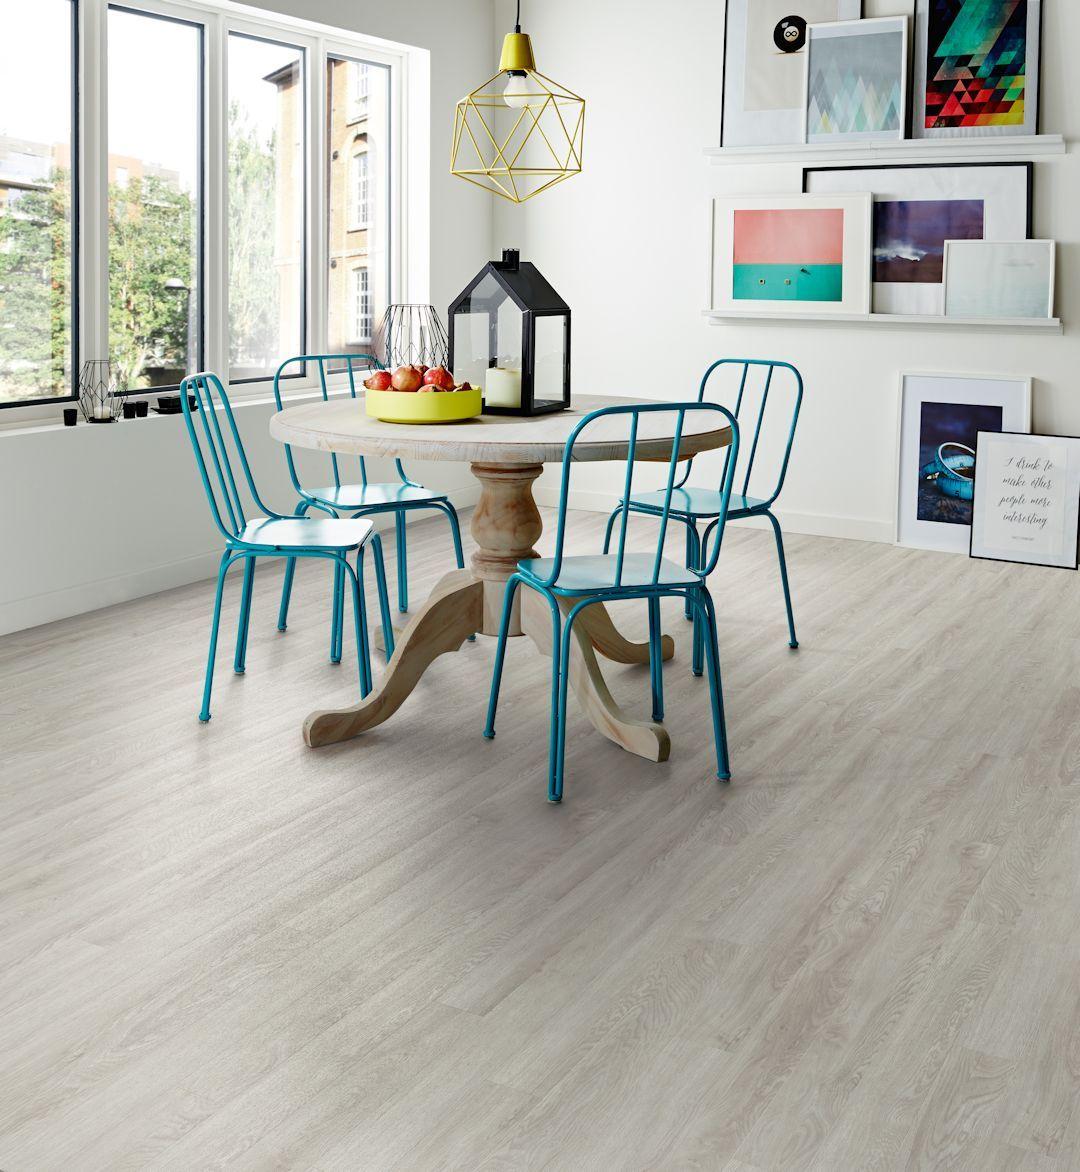 Bianco oak camaro luxury vinyl tile flooring featured in dining bianco oak camaro luxury vinyl tile flooring featured in dining room dailygadgetfo Image collections